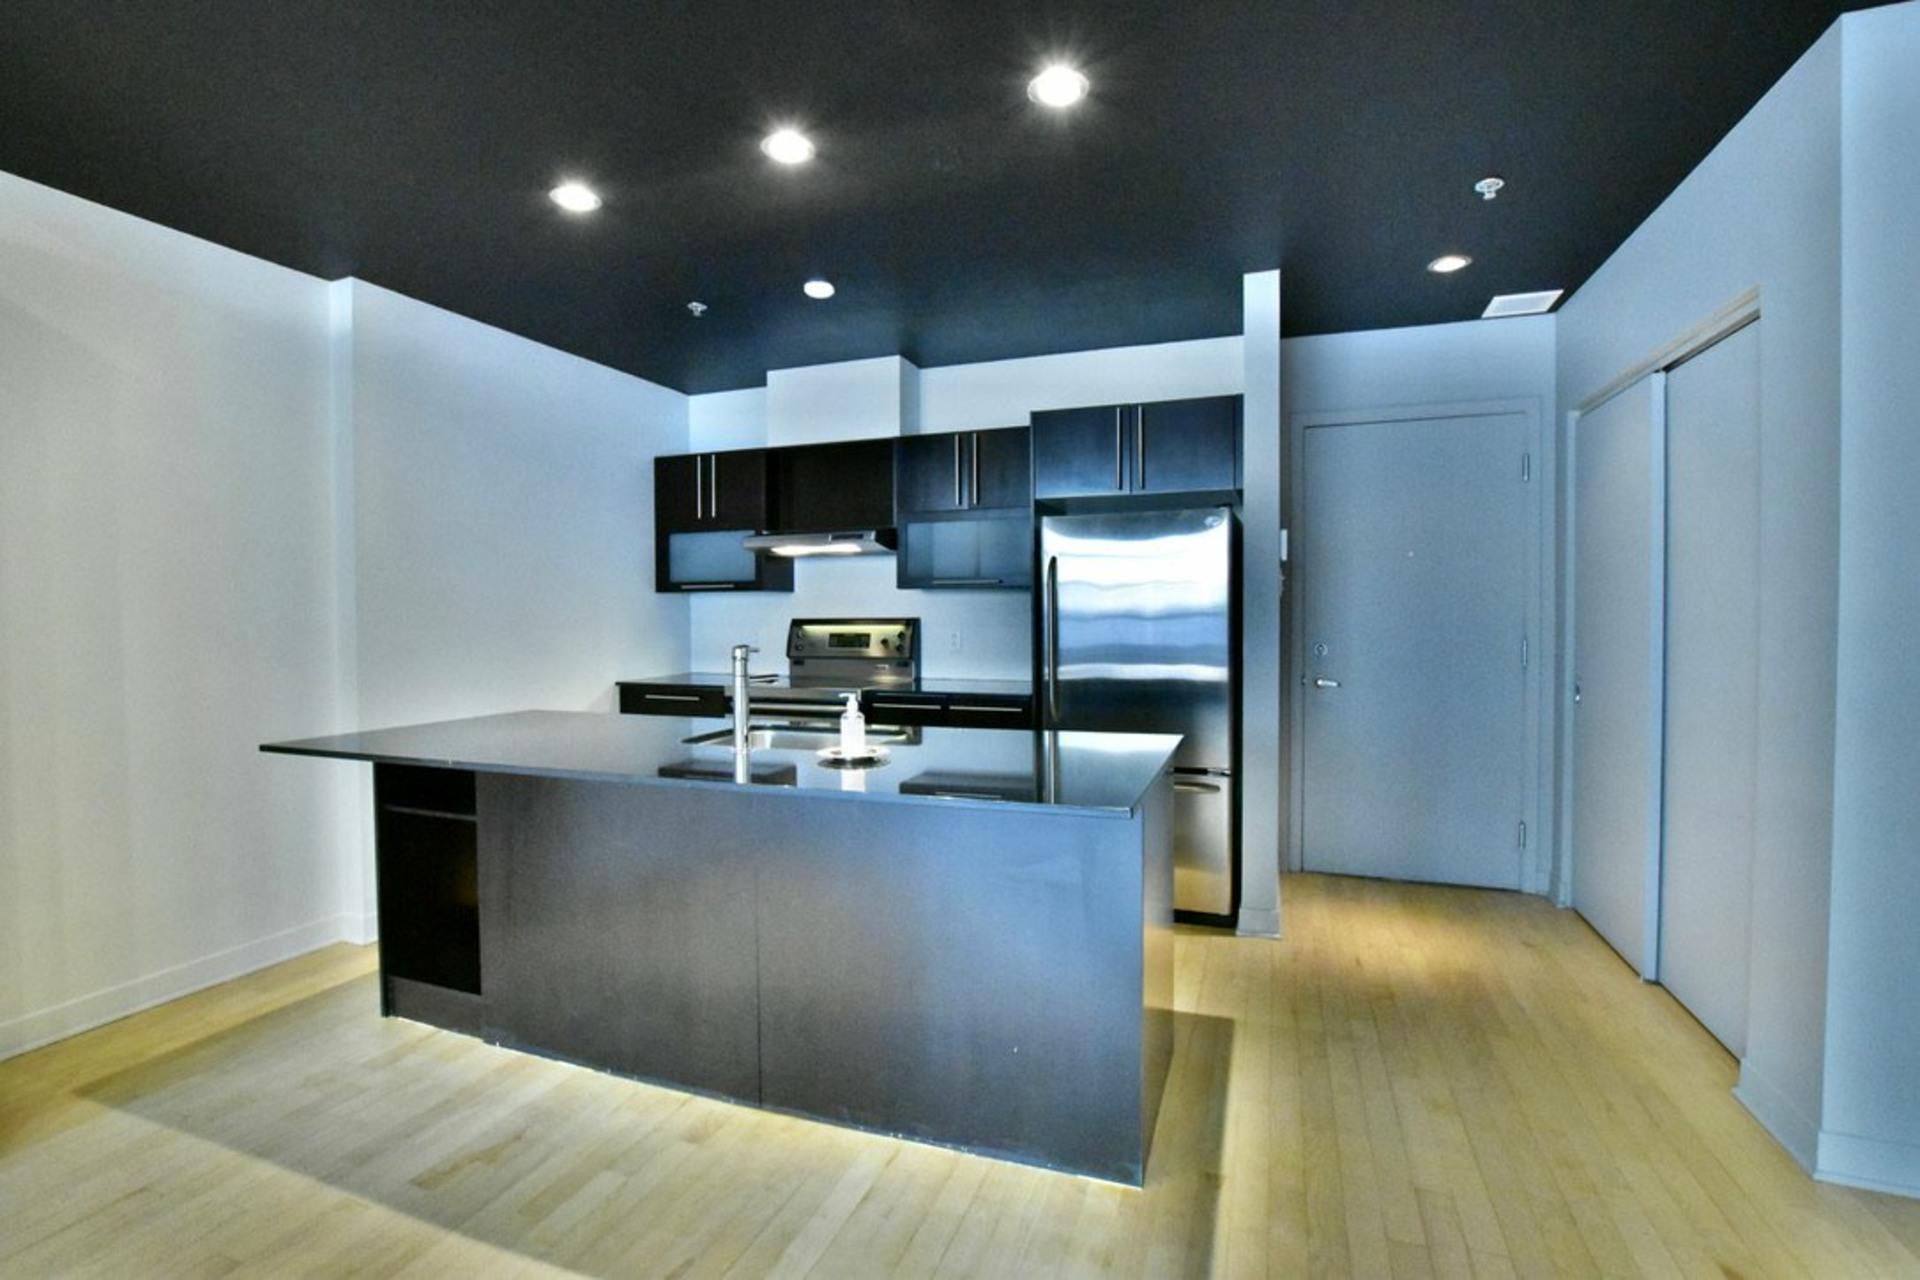 image 12 - Departamento Para alquiler Villeray/Saint-Michel/Parc-Extension Montréal  - 3 habitaciones